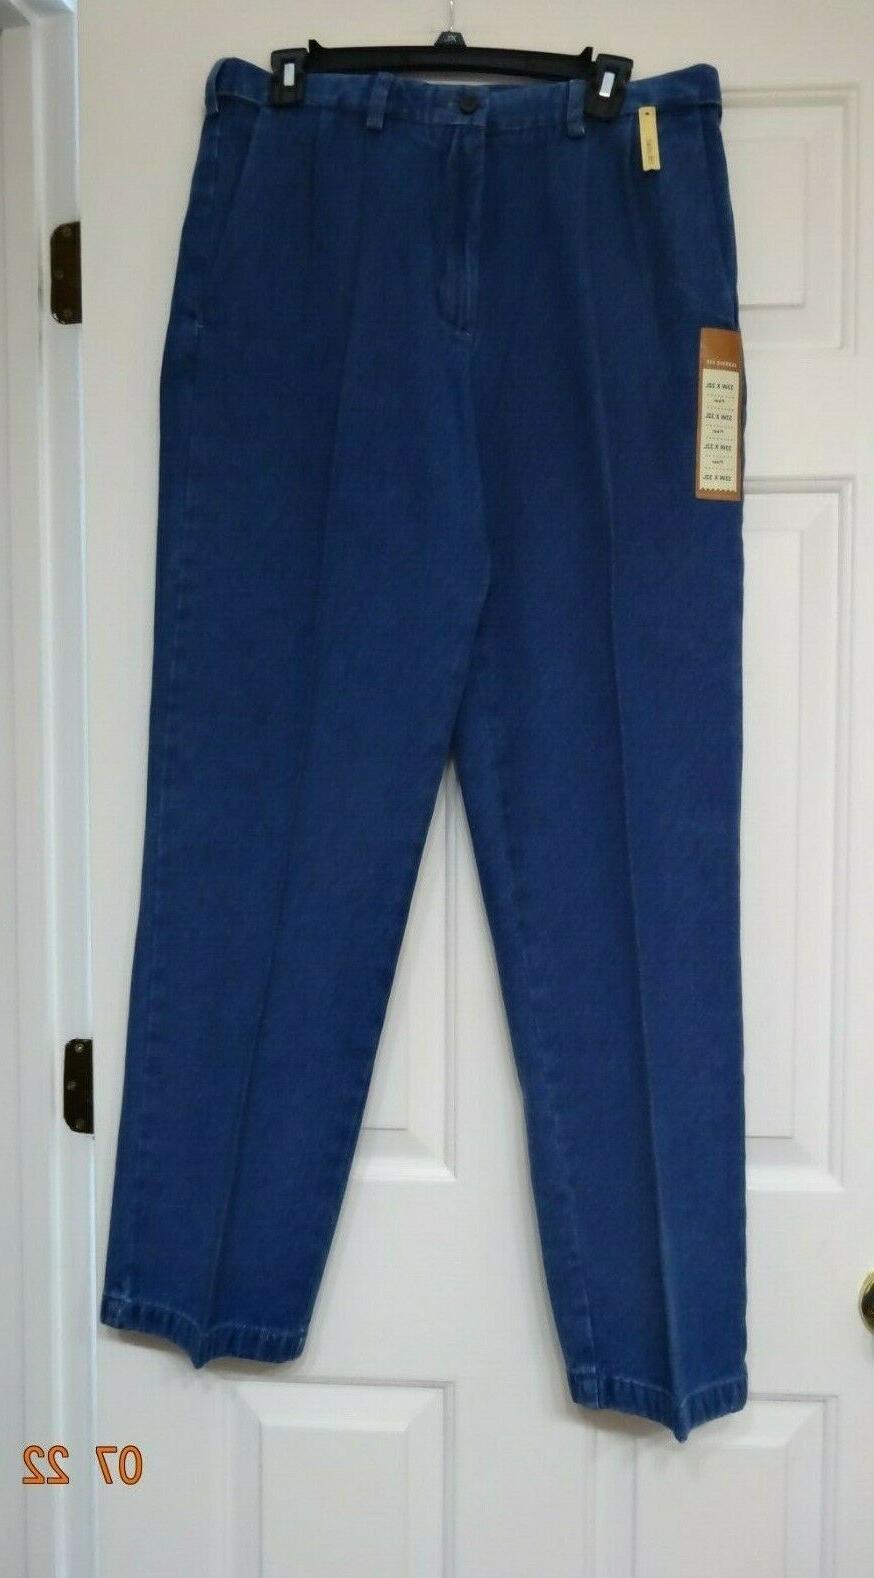 Haggar Comfort Waist Denim Men Jeans Blue Sz 33/32